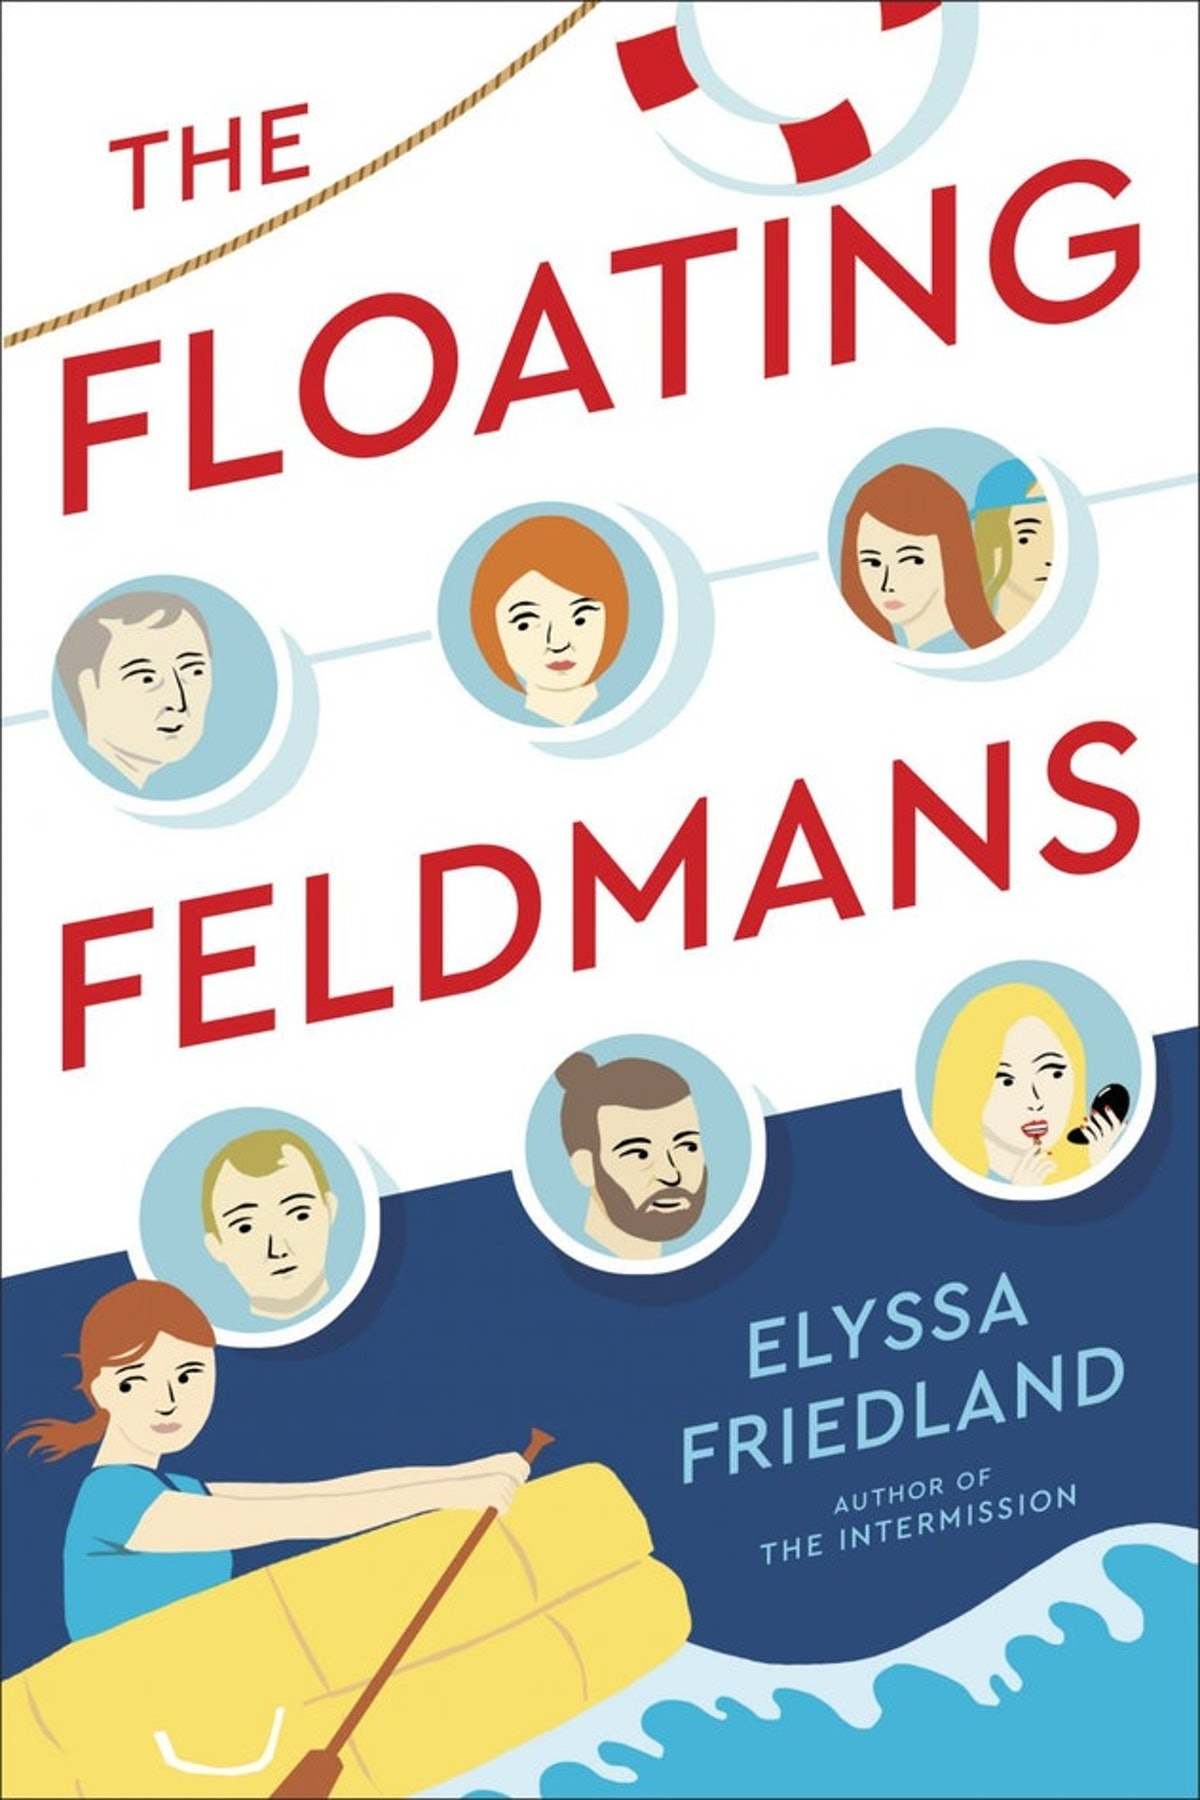 'The Floating Feldmans' by Elyssa Friedland